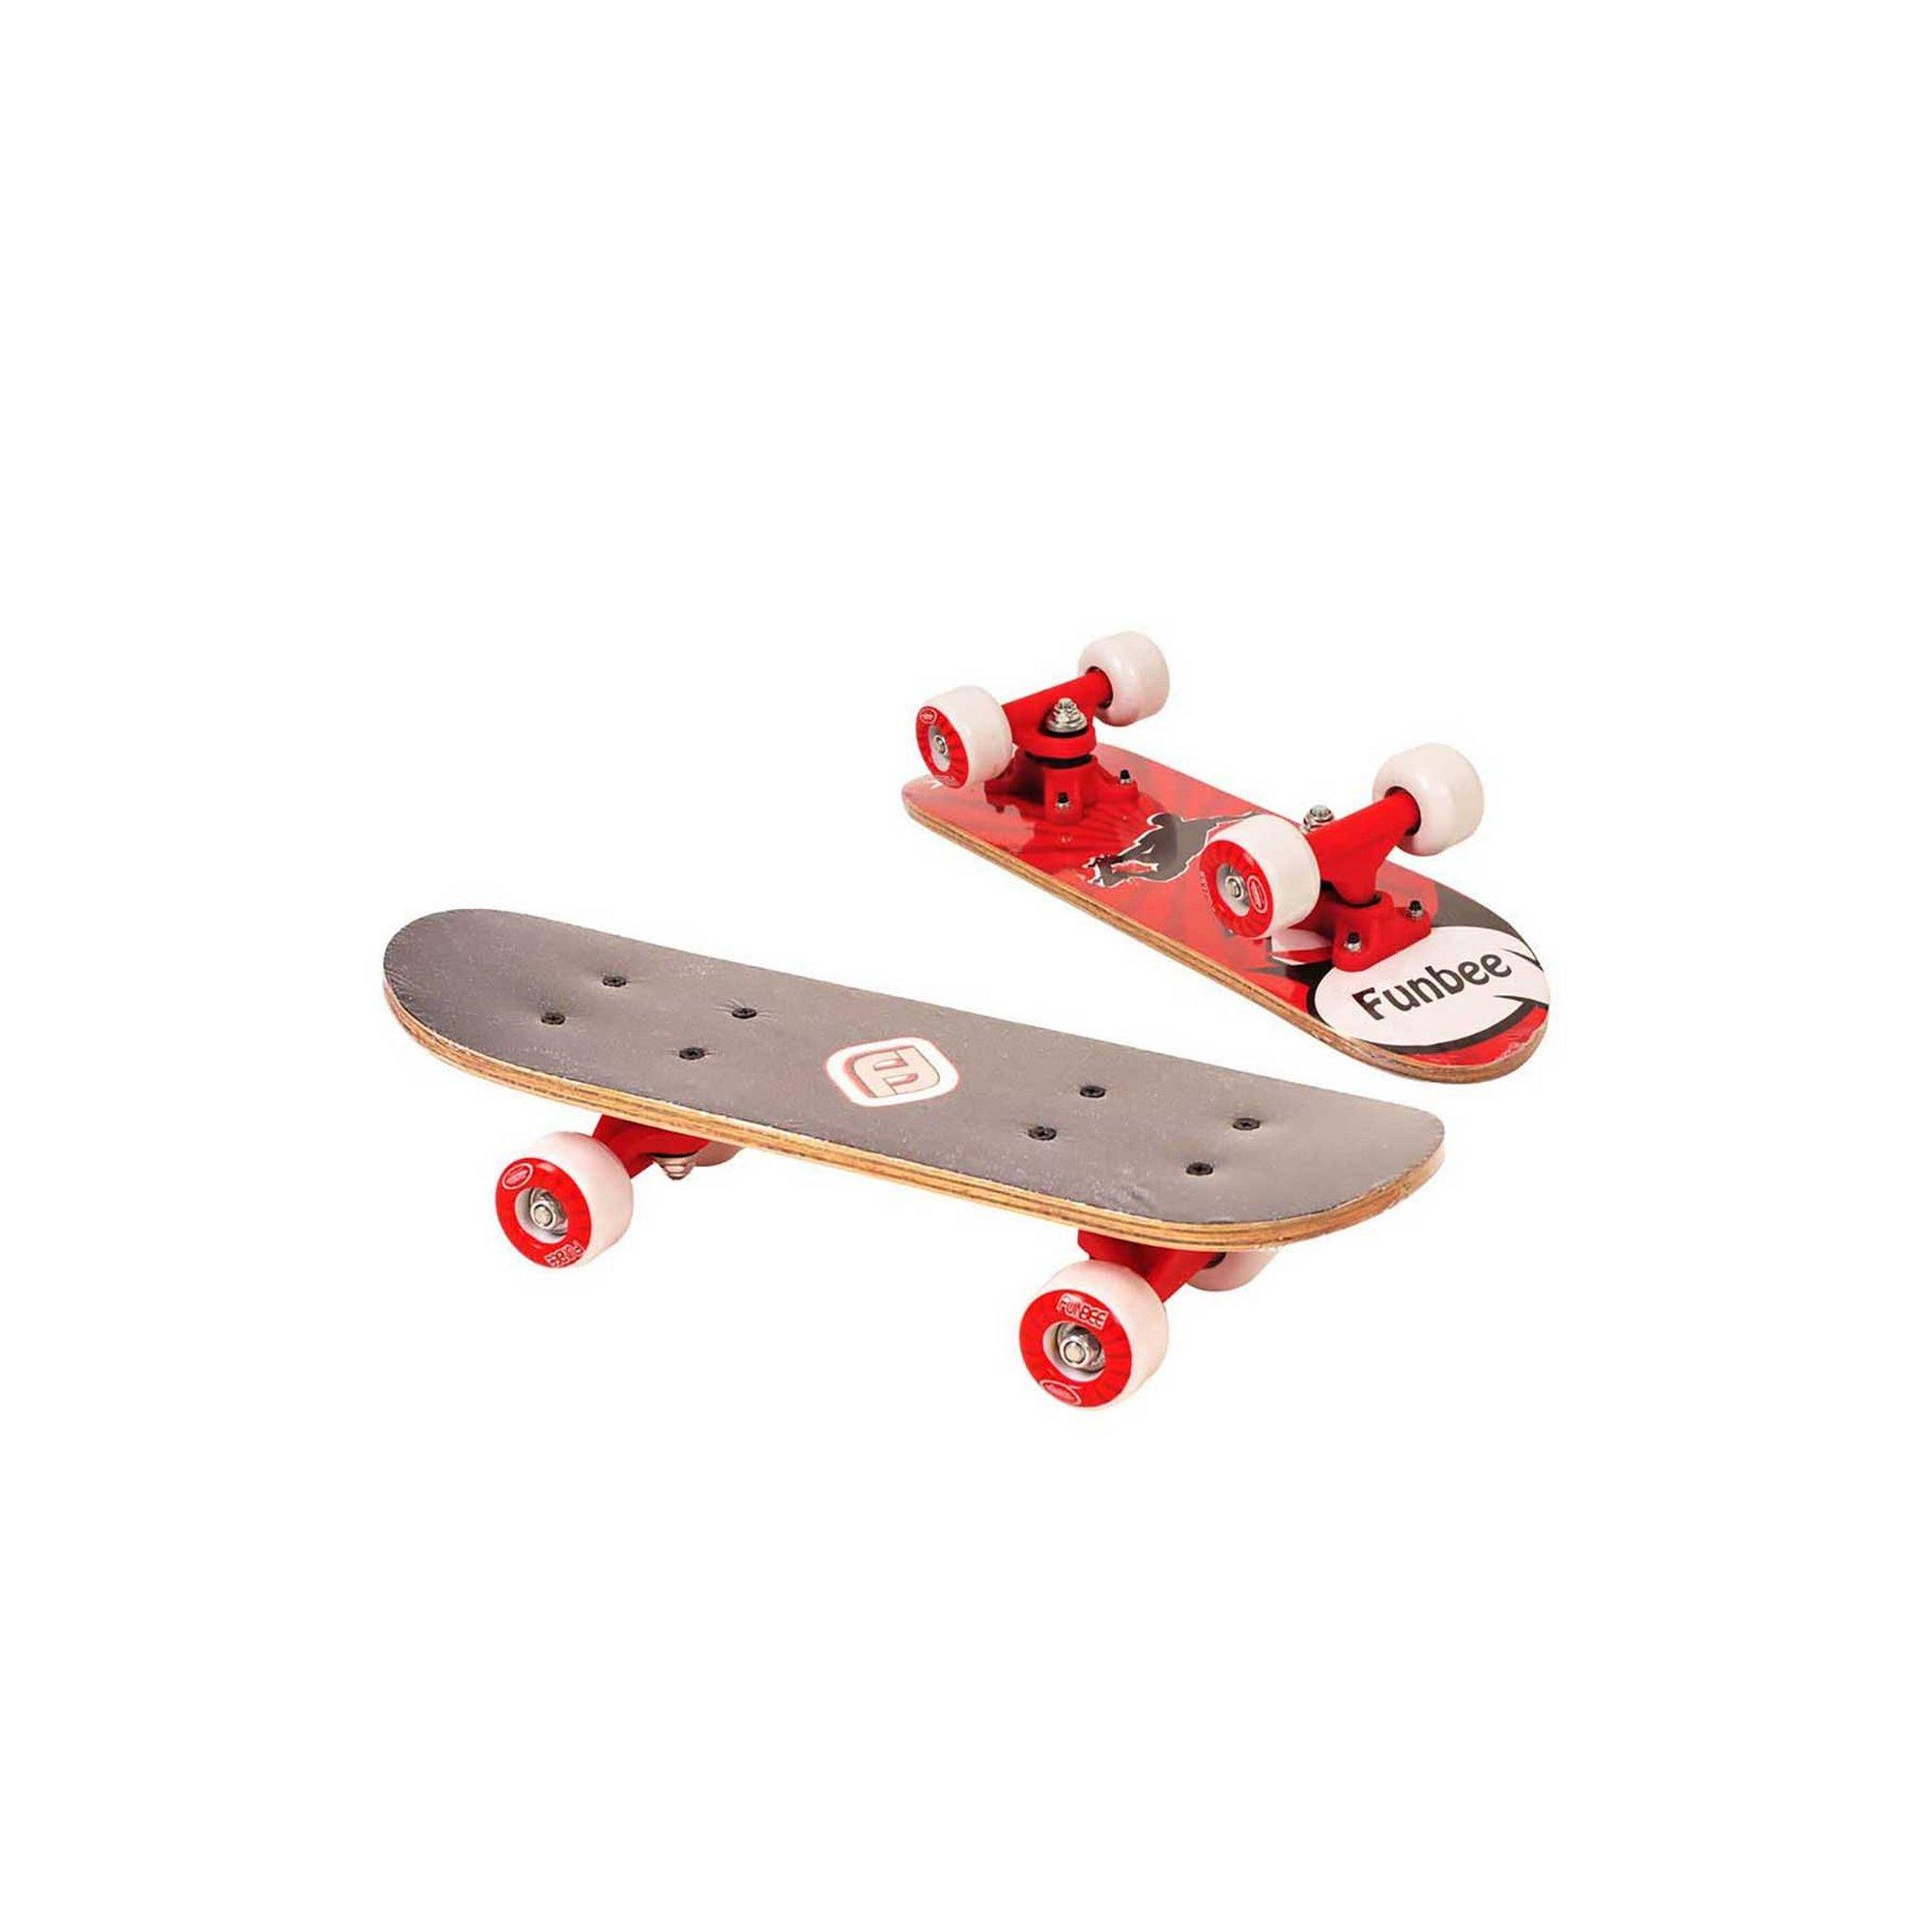 Image of Funbee Childrens 17 Inch Maple Wood Mini Skateboard Cruiser